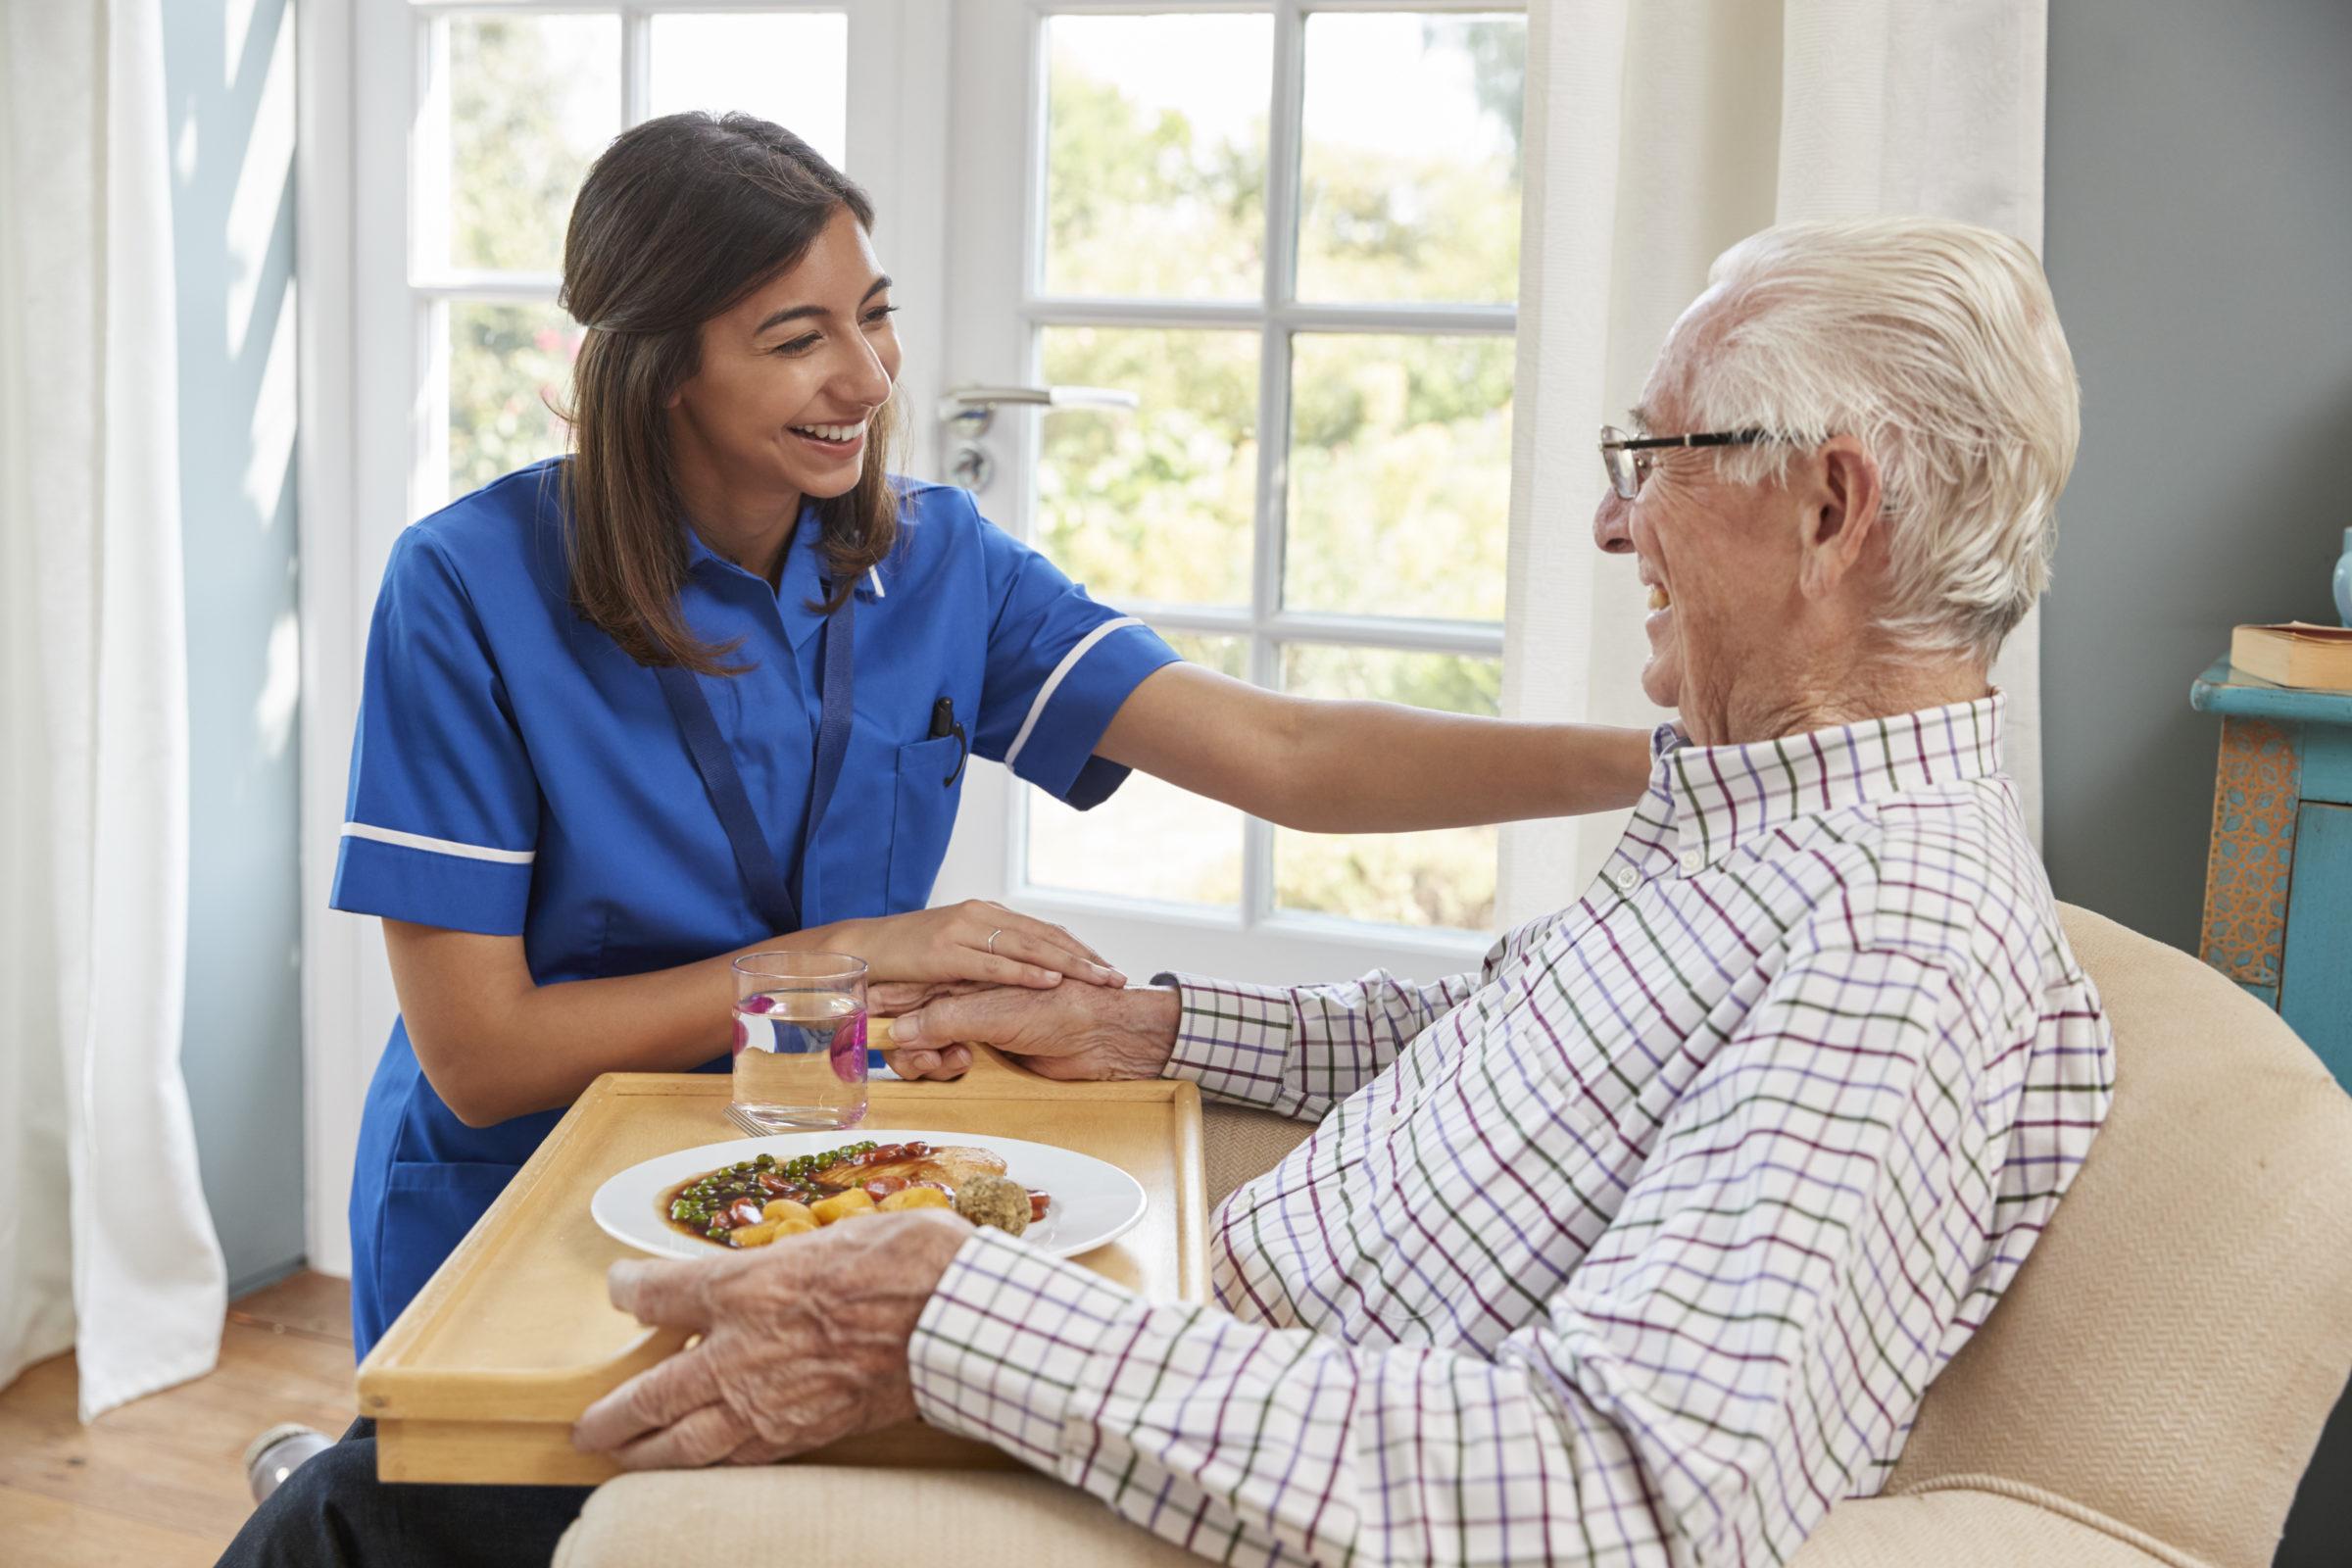 nurse serving dinner to a senior man in an armchai PHNDR42